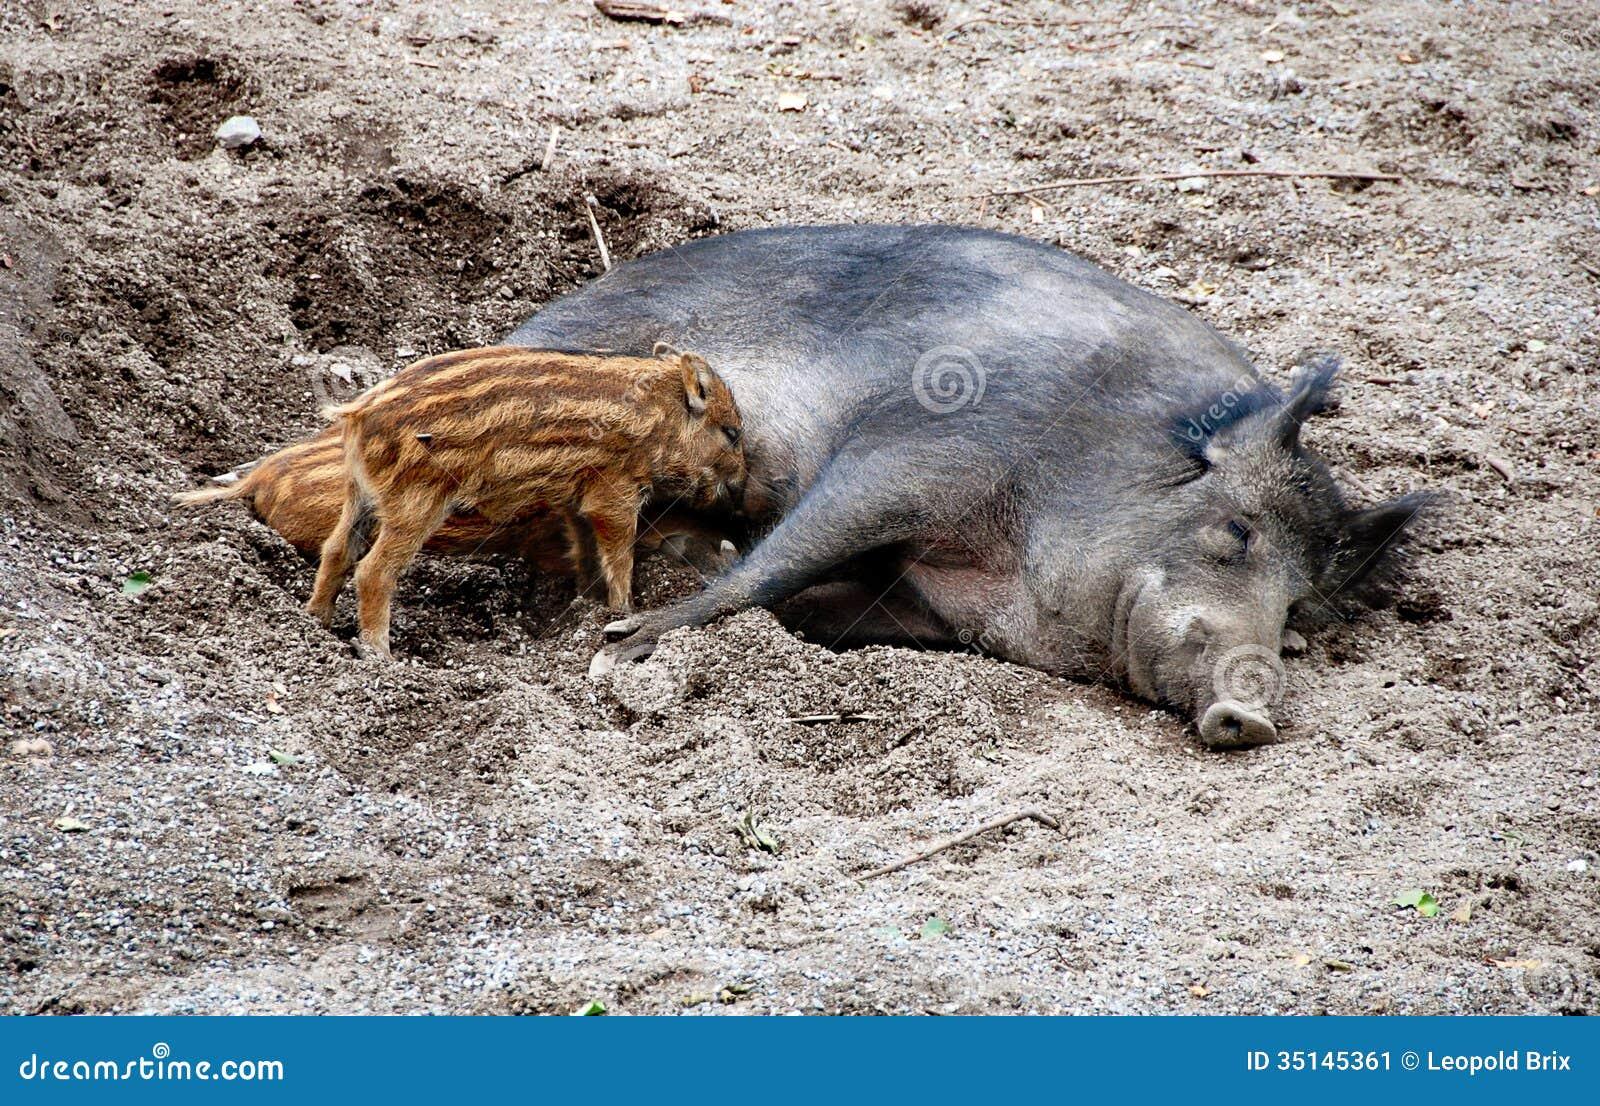 feral pig attack